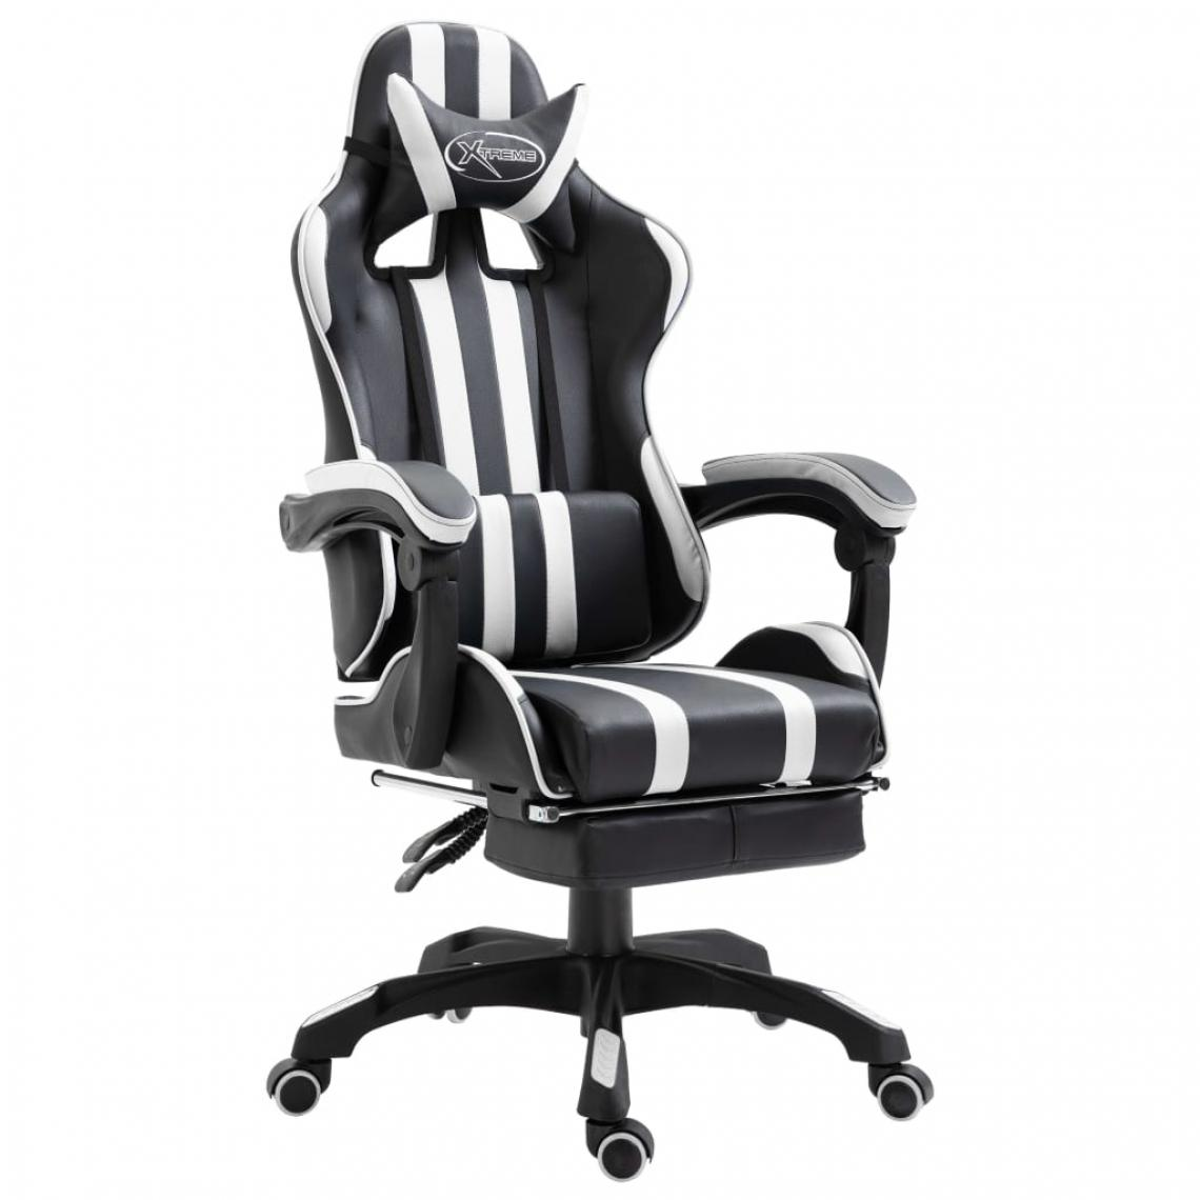 Uco UCO Chaise de jeu avec repose-pied Blanc Similicuir